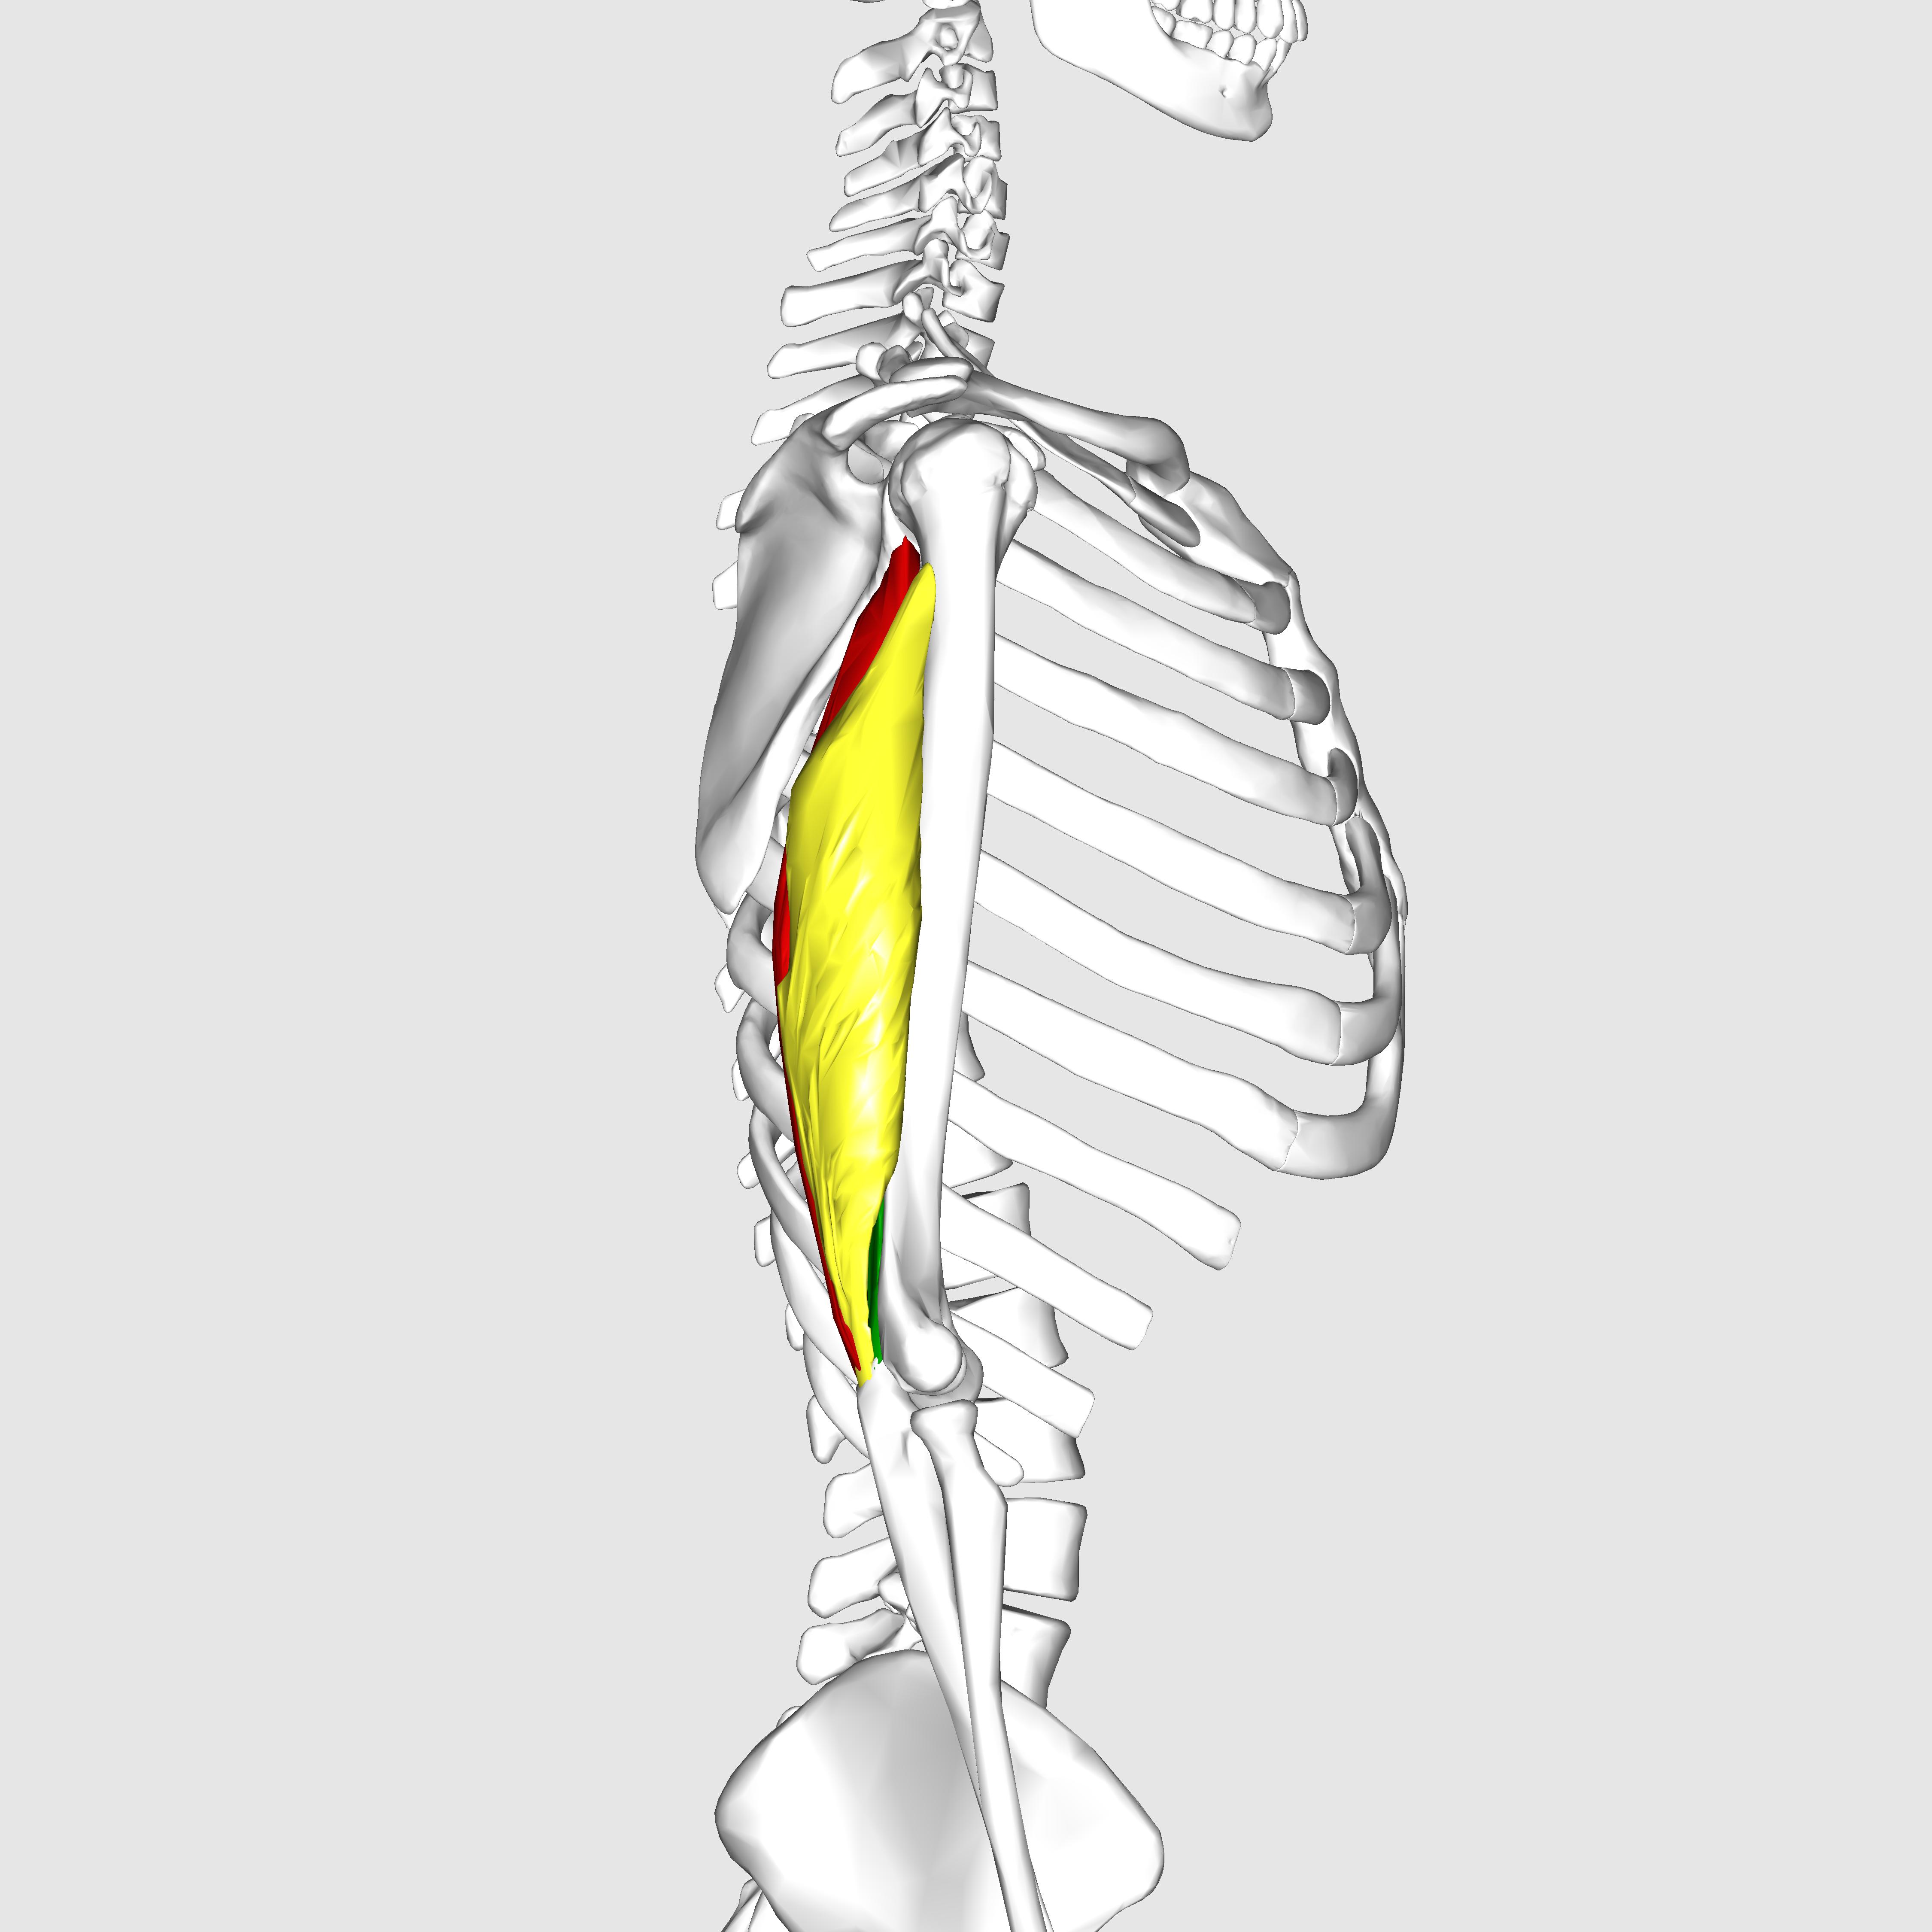 Filetriceps Brachii Muscle08g Wikimedia Commons